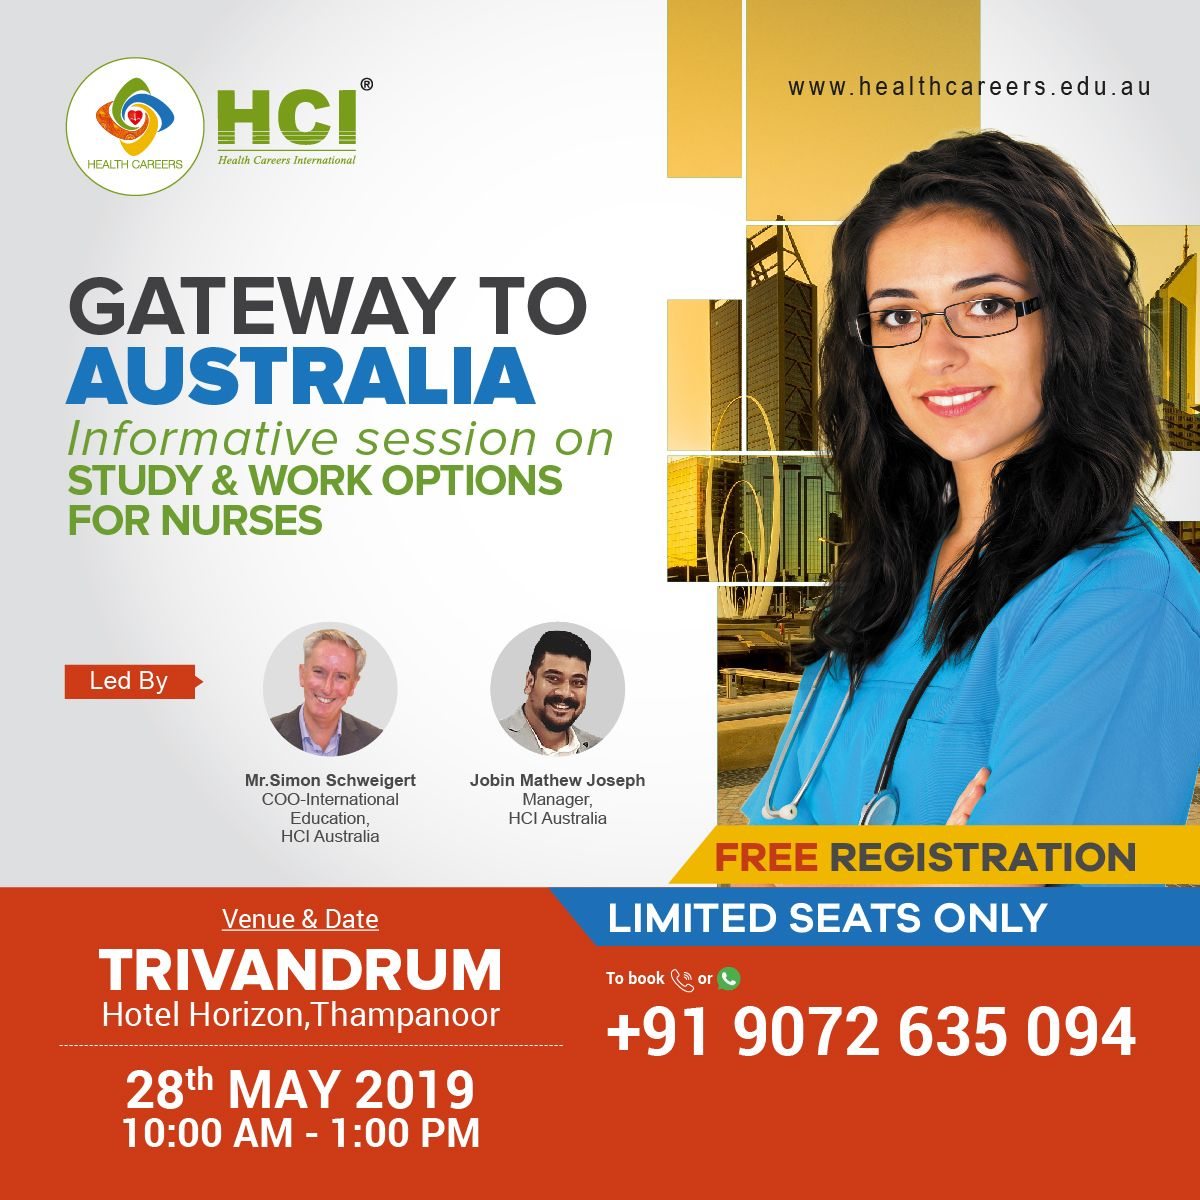 Launch Your Dream Career in Australian Healthcare